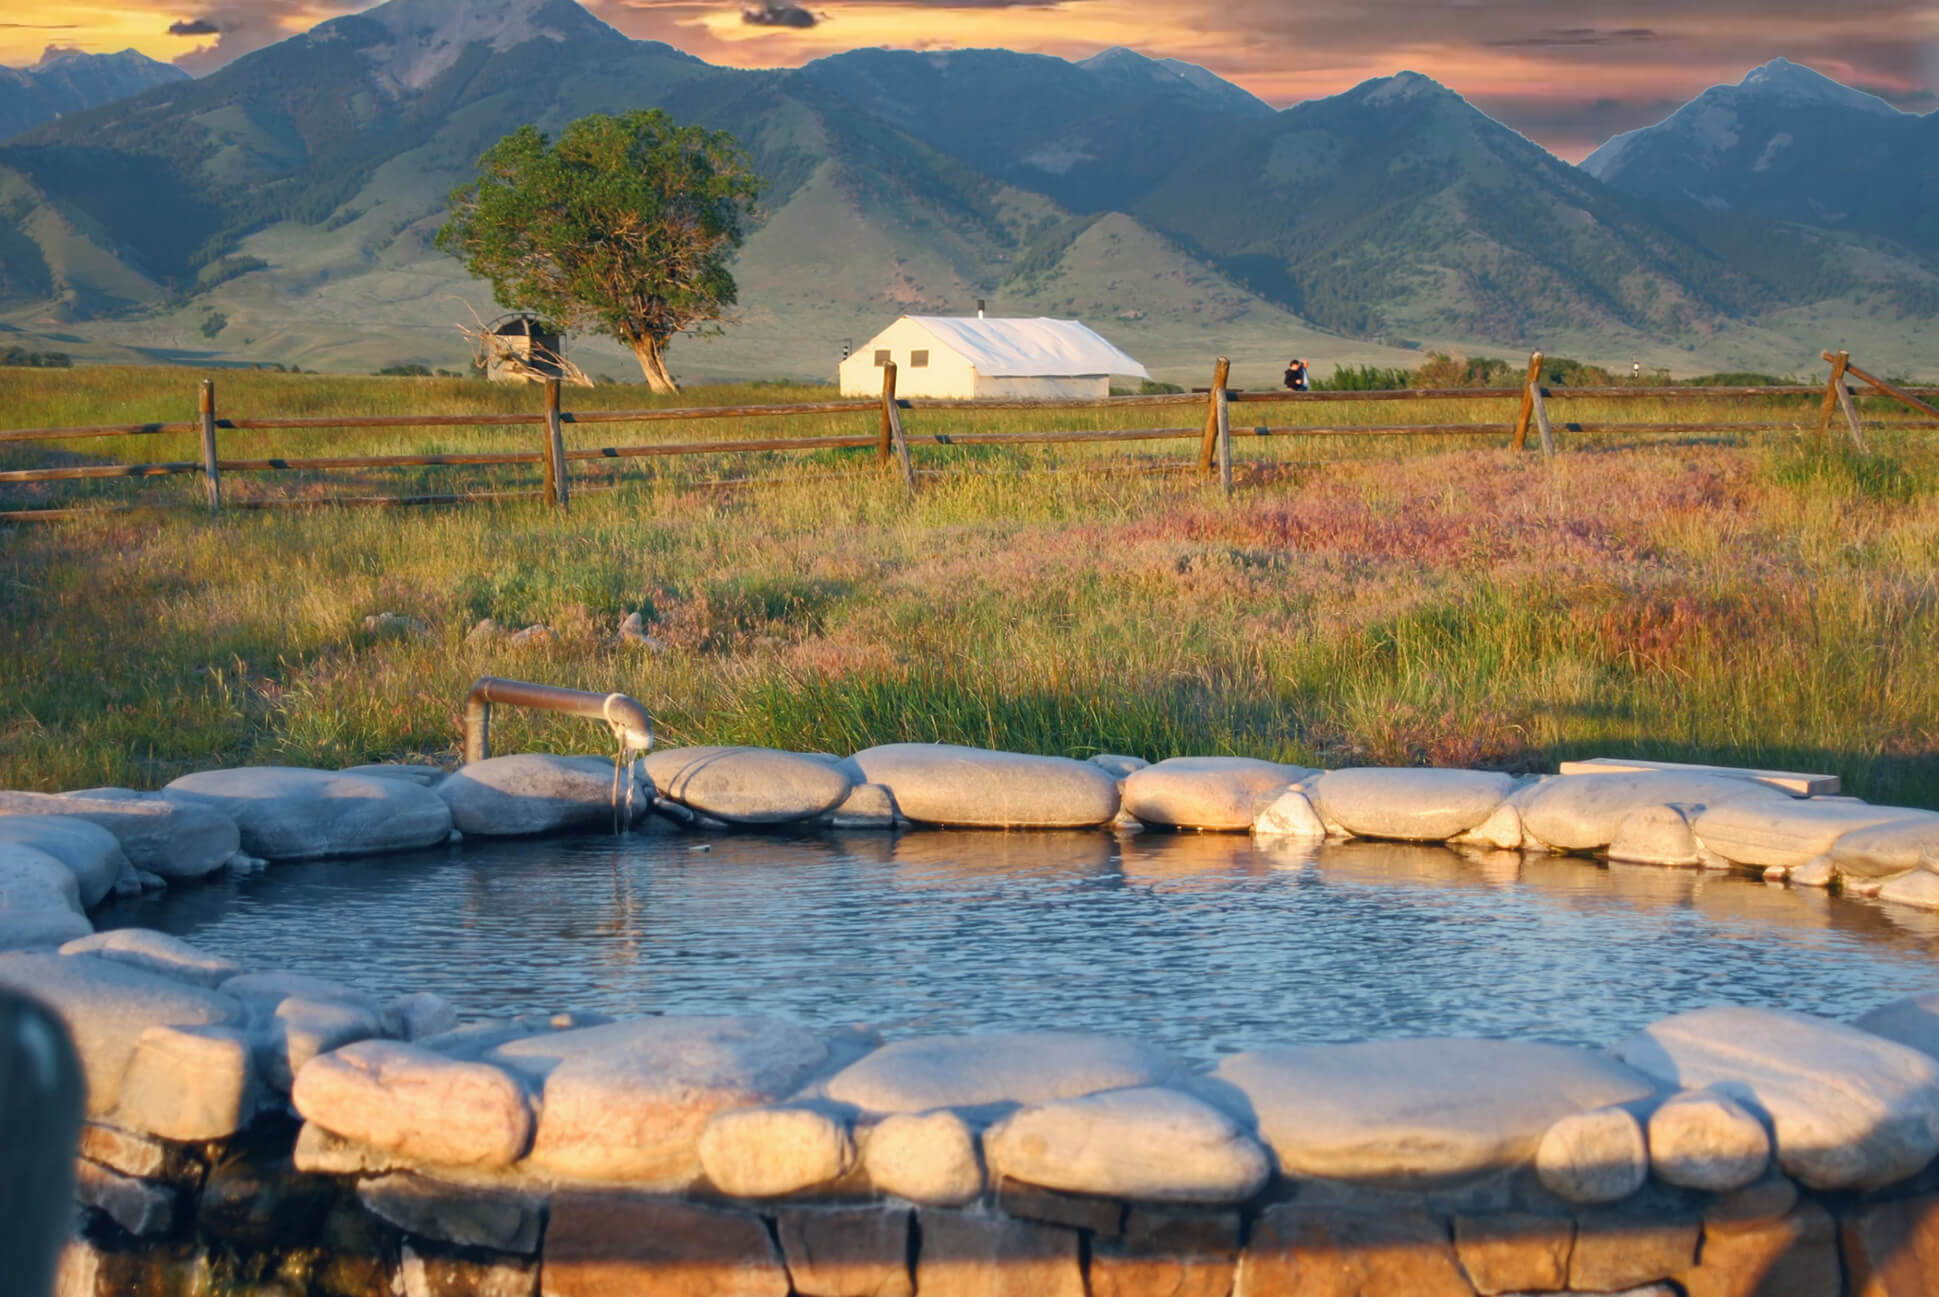 Hot Springs Montana Glamping